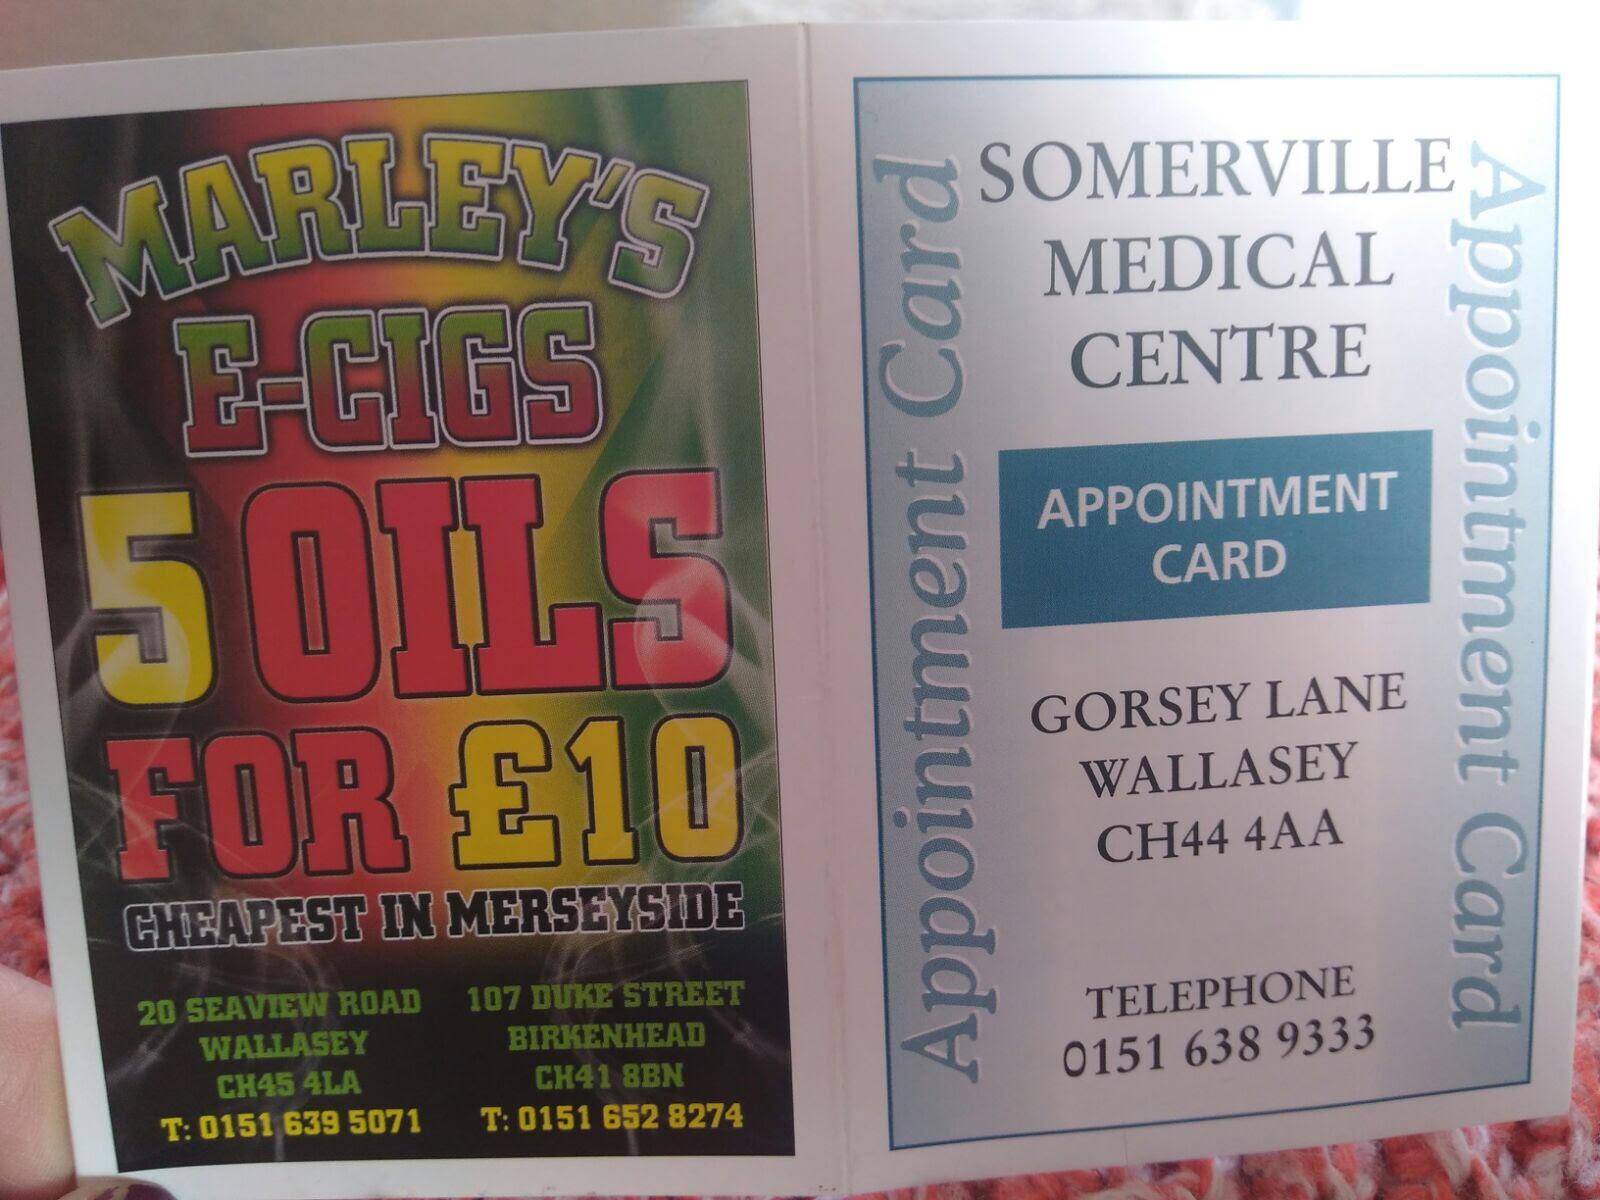 Marley's E-cigs